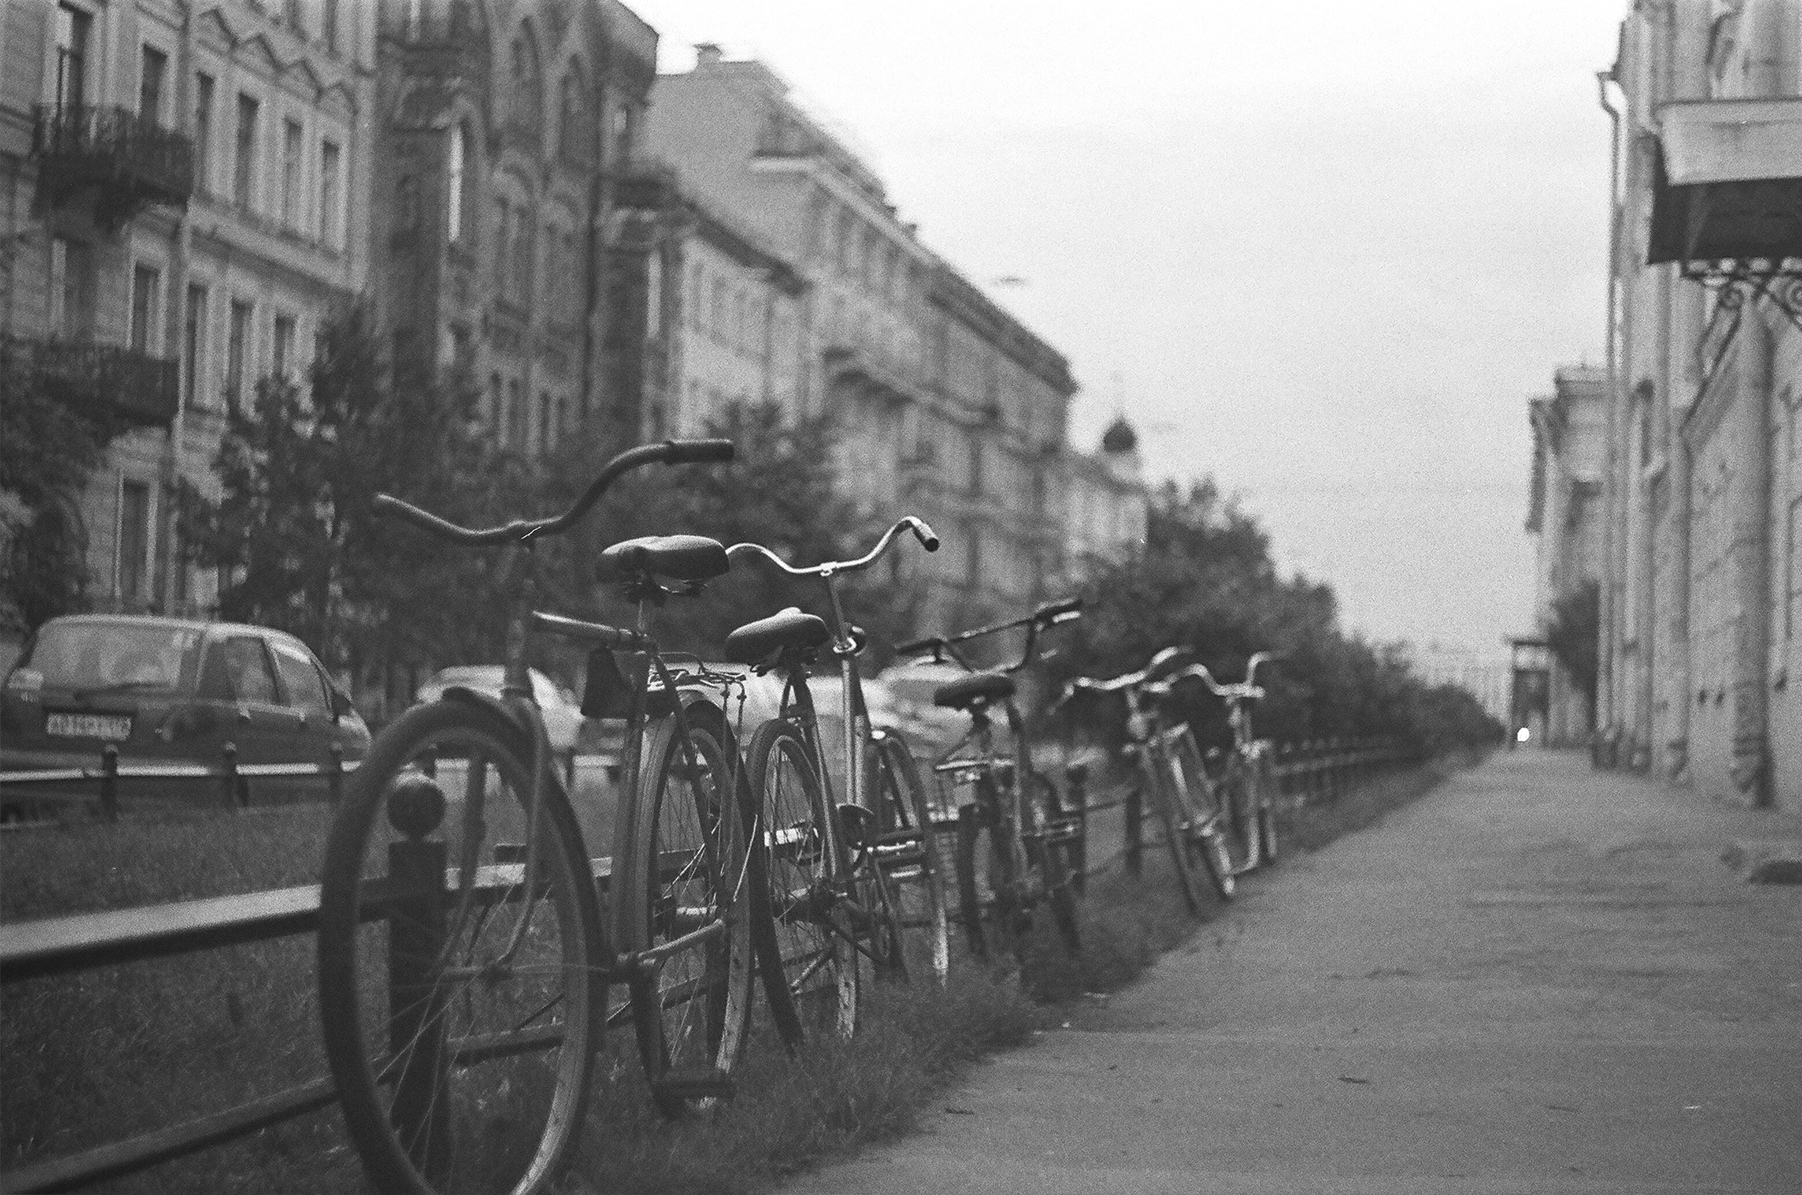 Students' Bicycles | Zenit TTL | Helios 44 f/2 | Robert Potekhin